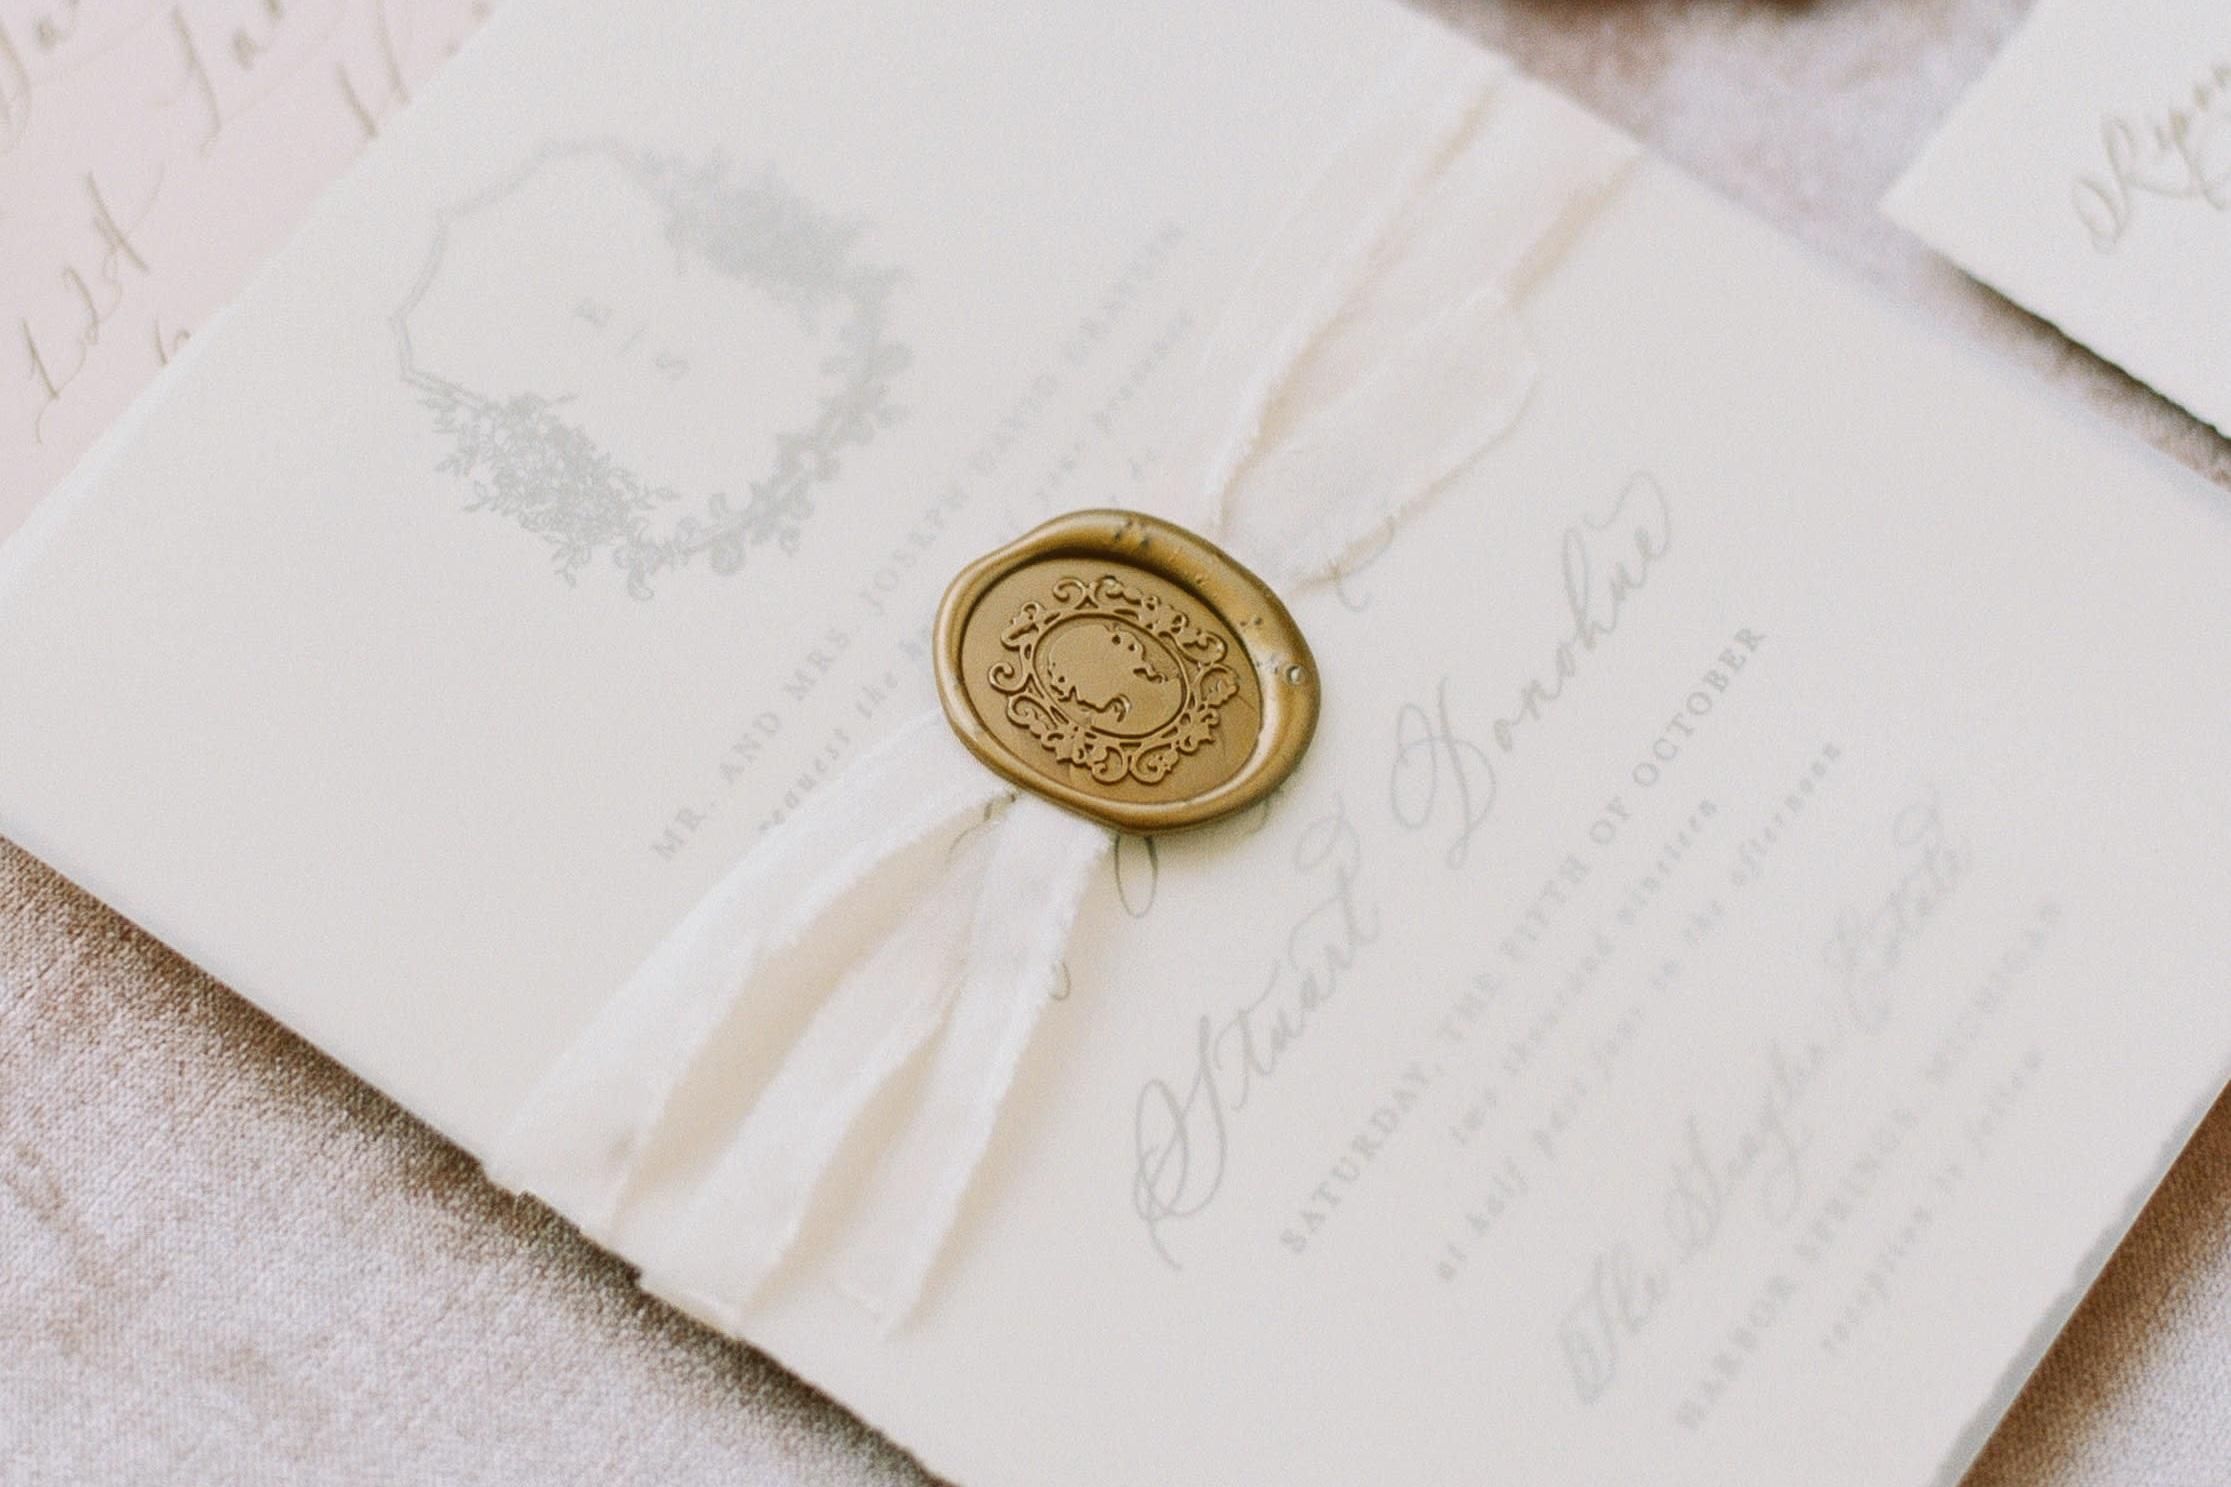 Classic wedding invitations with vellum overlay, silk ribbon and custom antique gold wax seals.